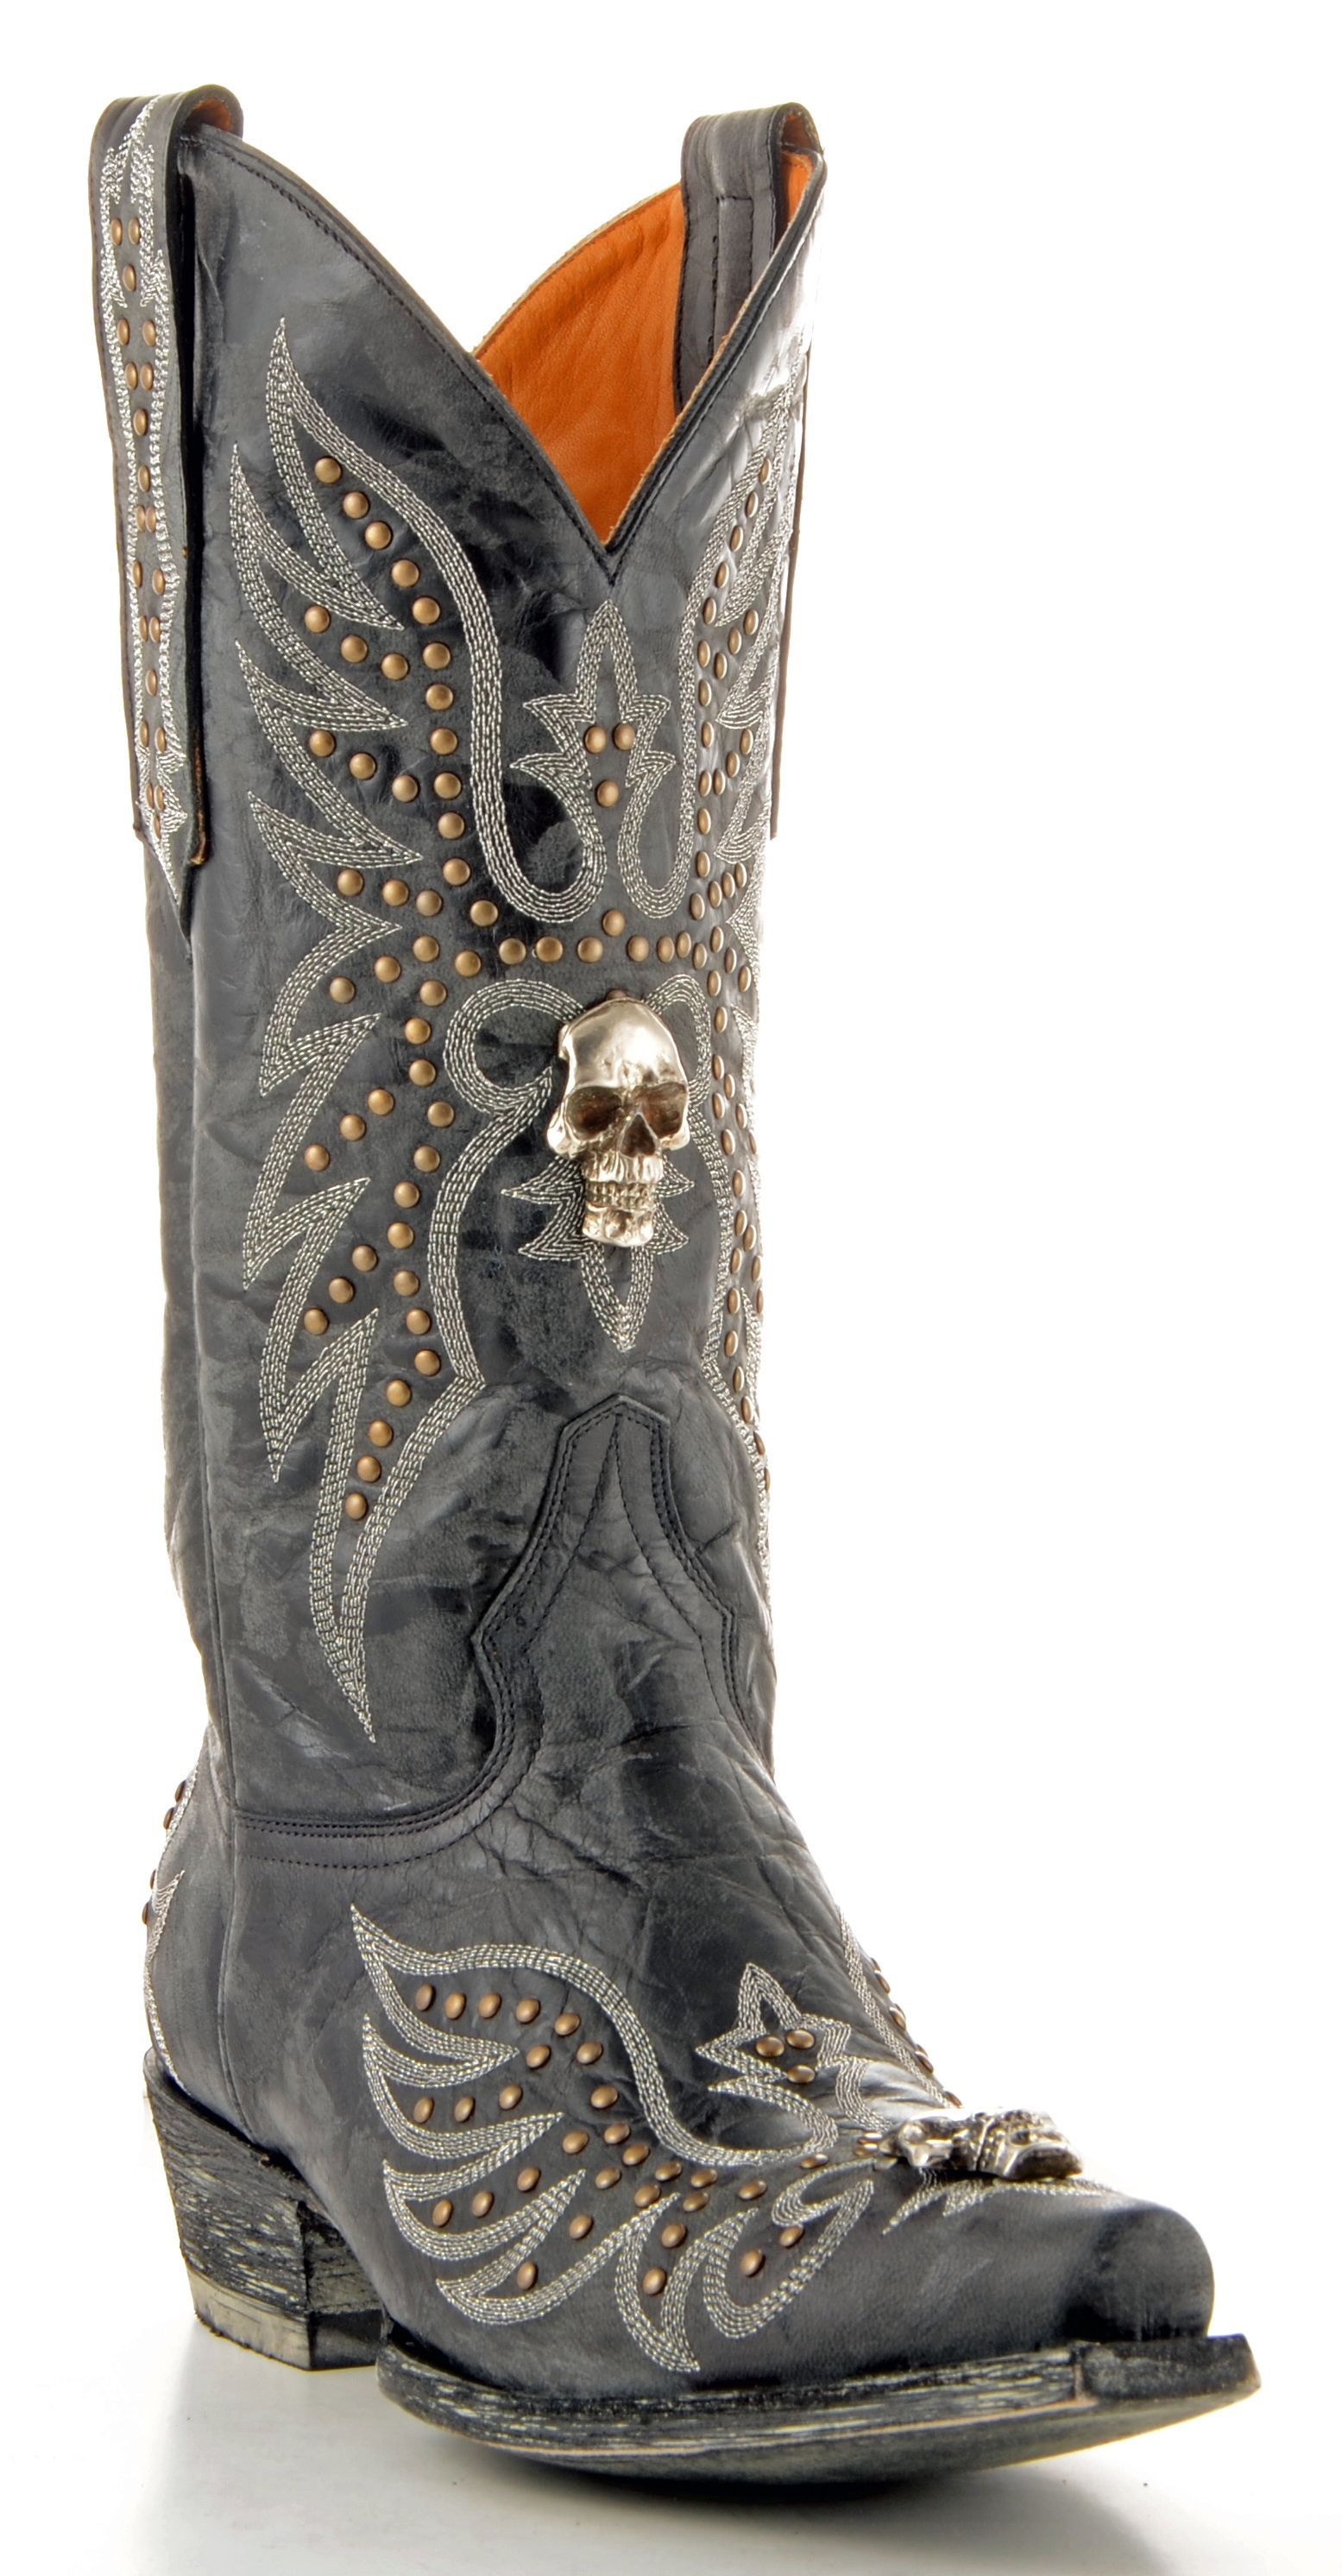 Men's Old Gringo Hitchcock Boots Black/Silver #M588-2 | Skulls ...